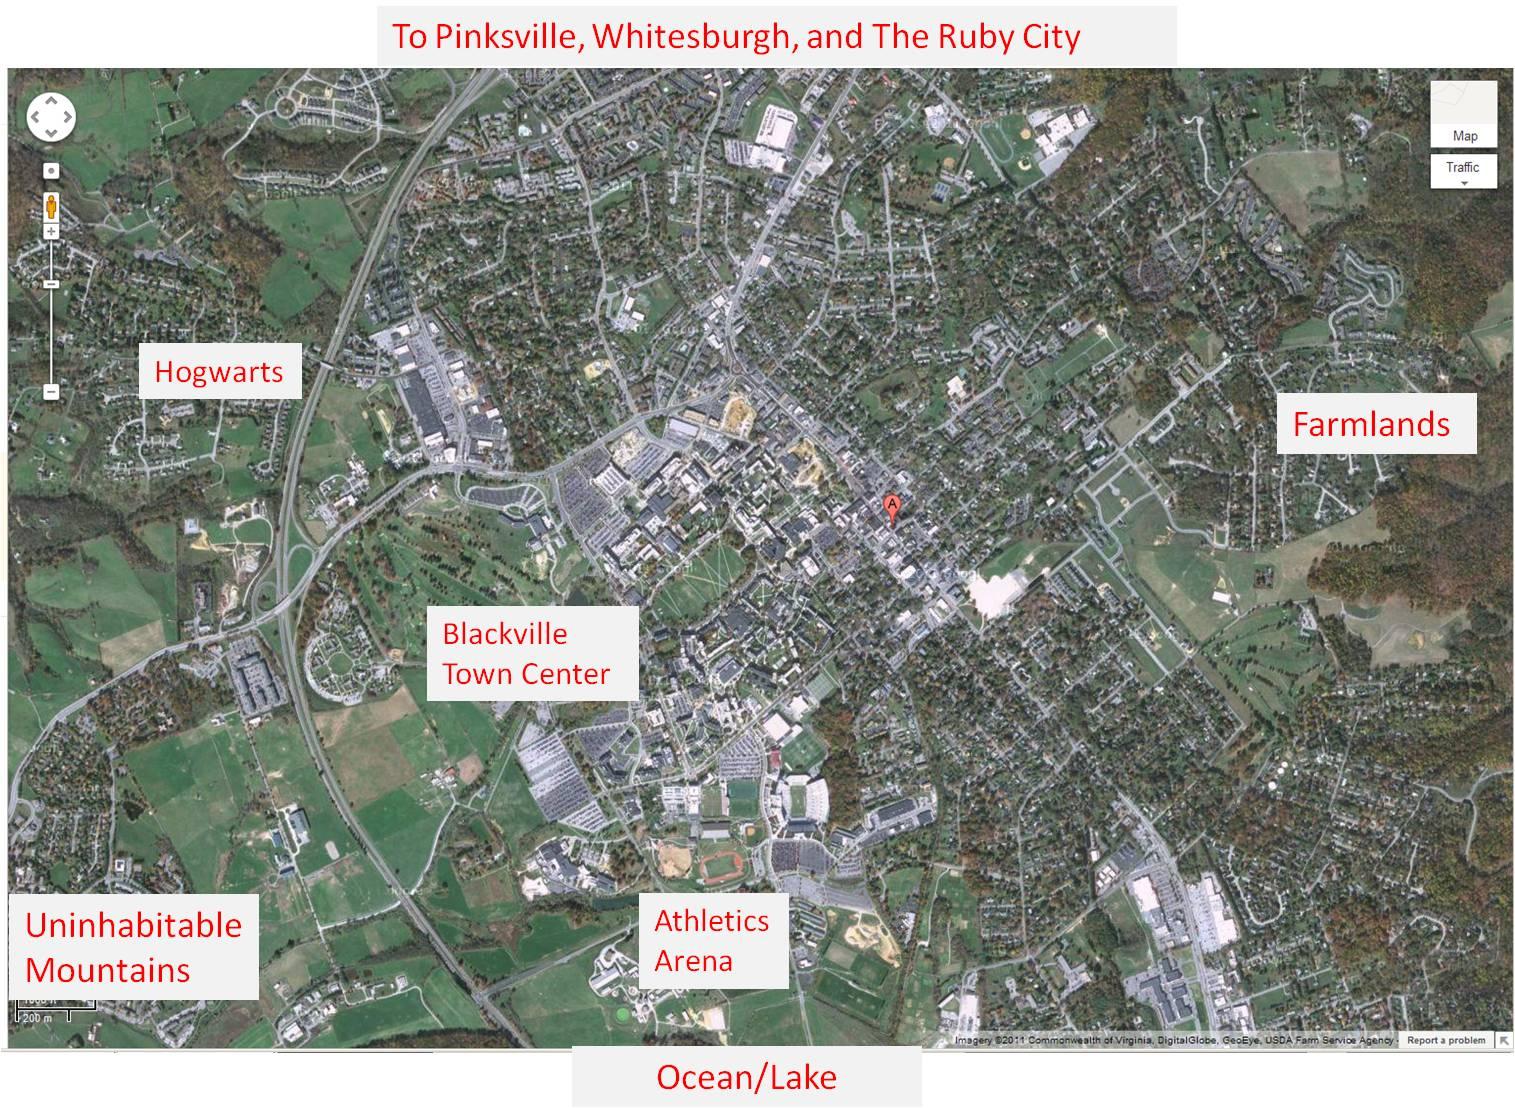 Blackville general map